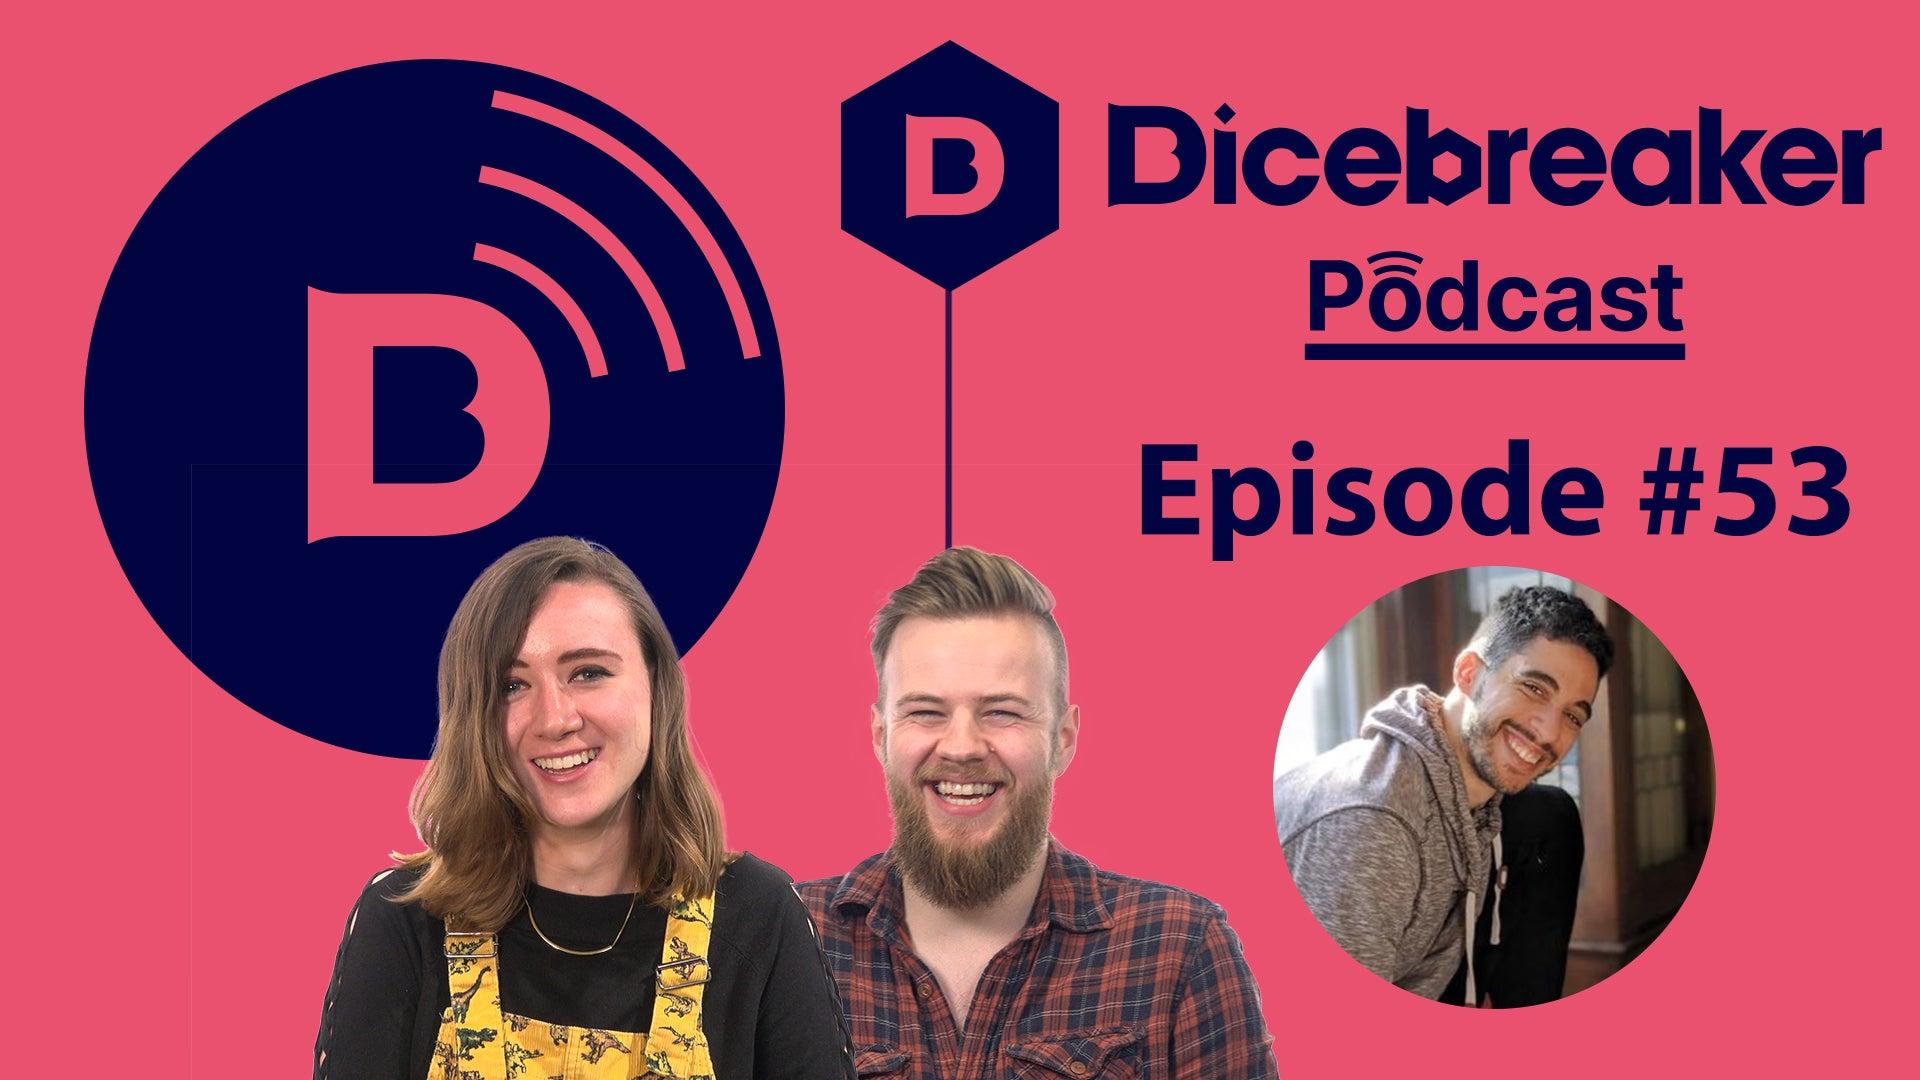 Dicebreaker podcast episode 53